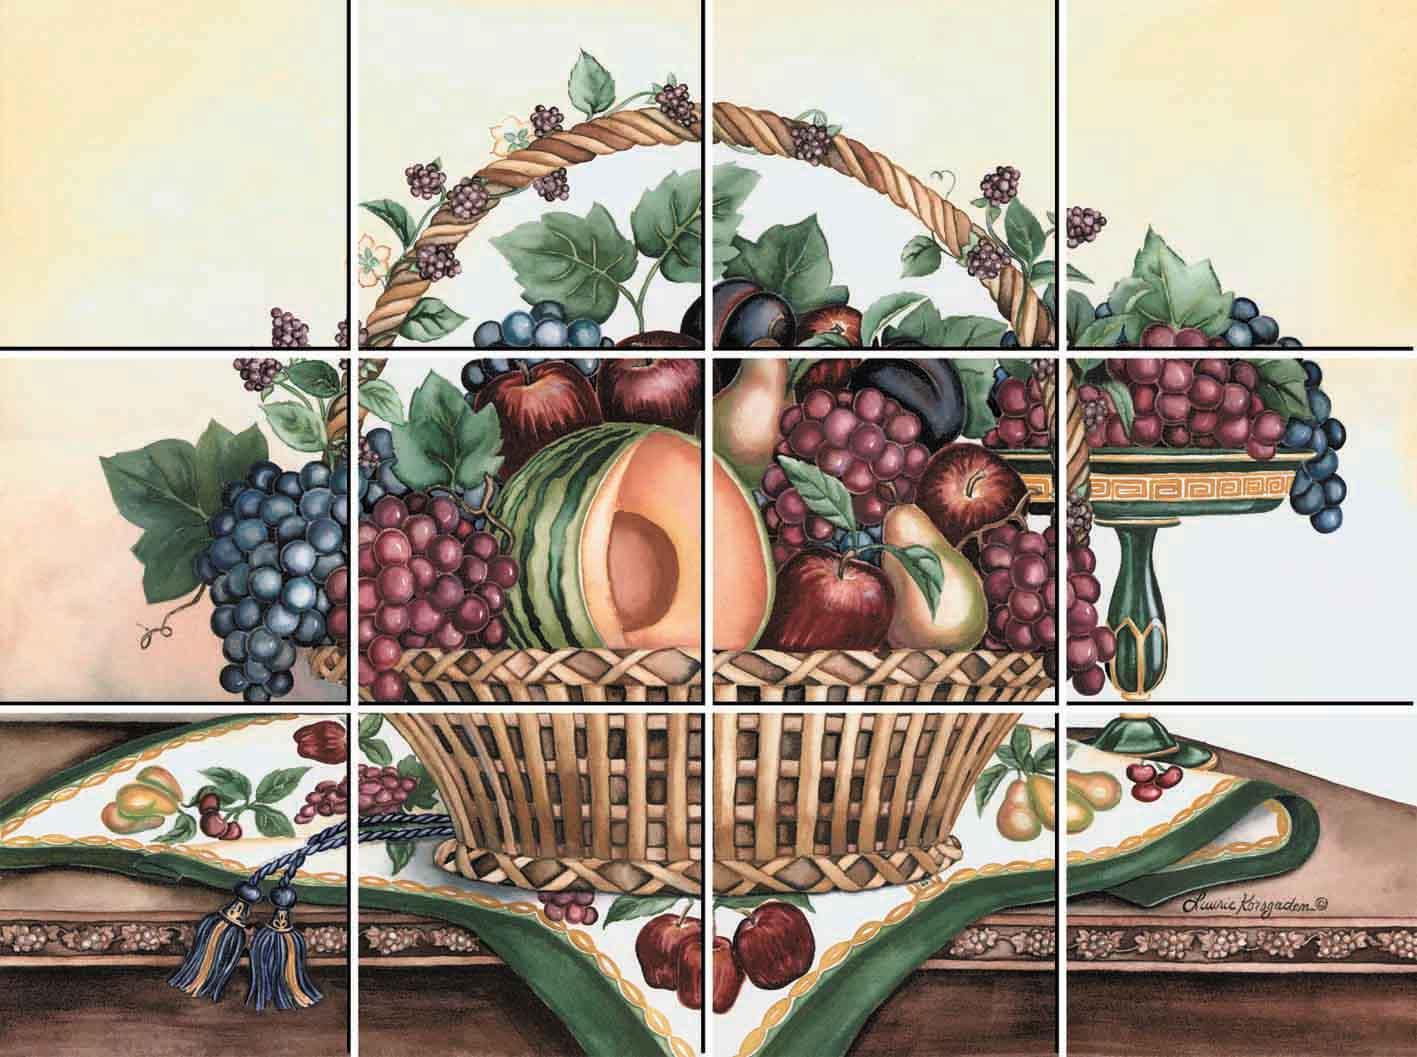 IdeaStix Fruit Basket 12-Piece Tile Mural - Original Premium Peel and Stick D??cor